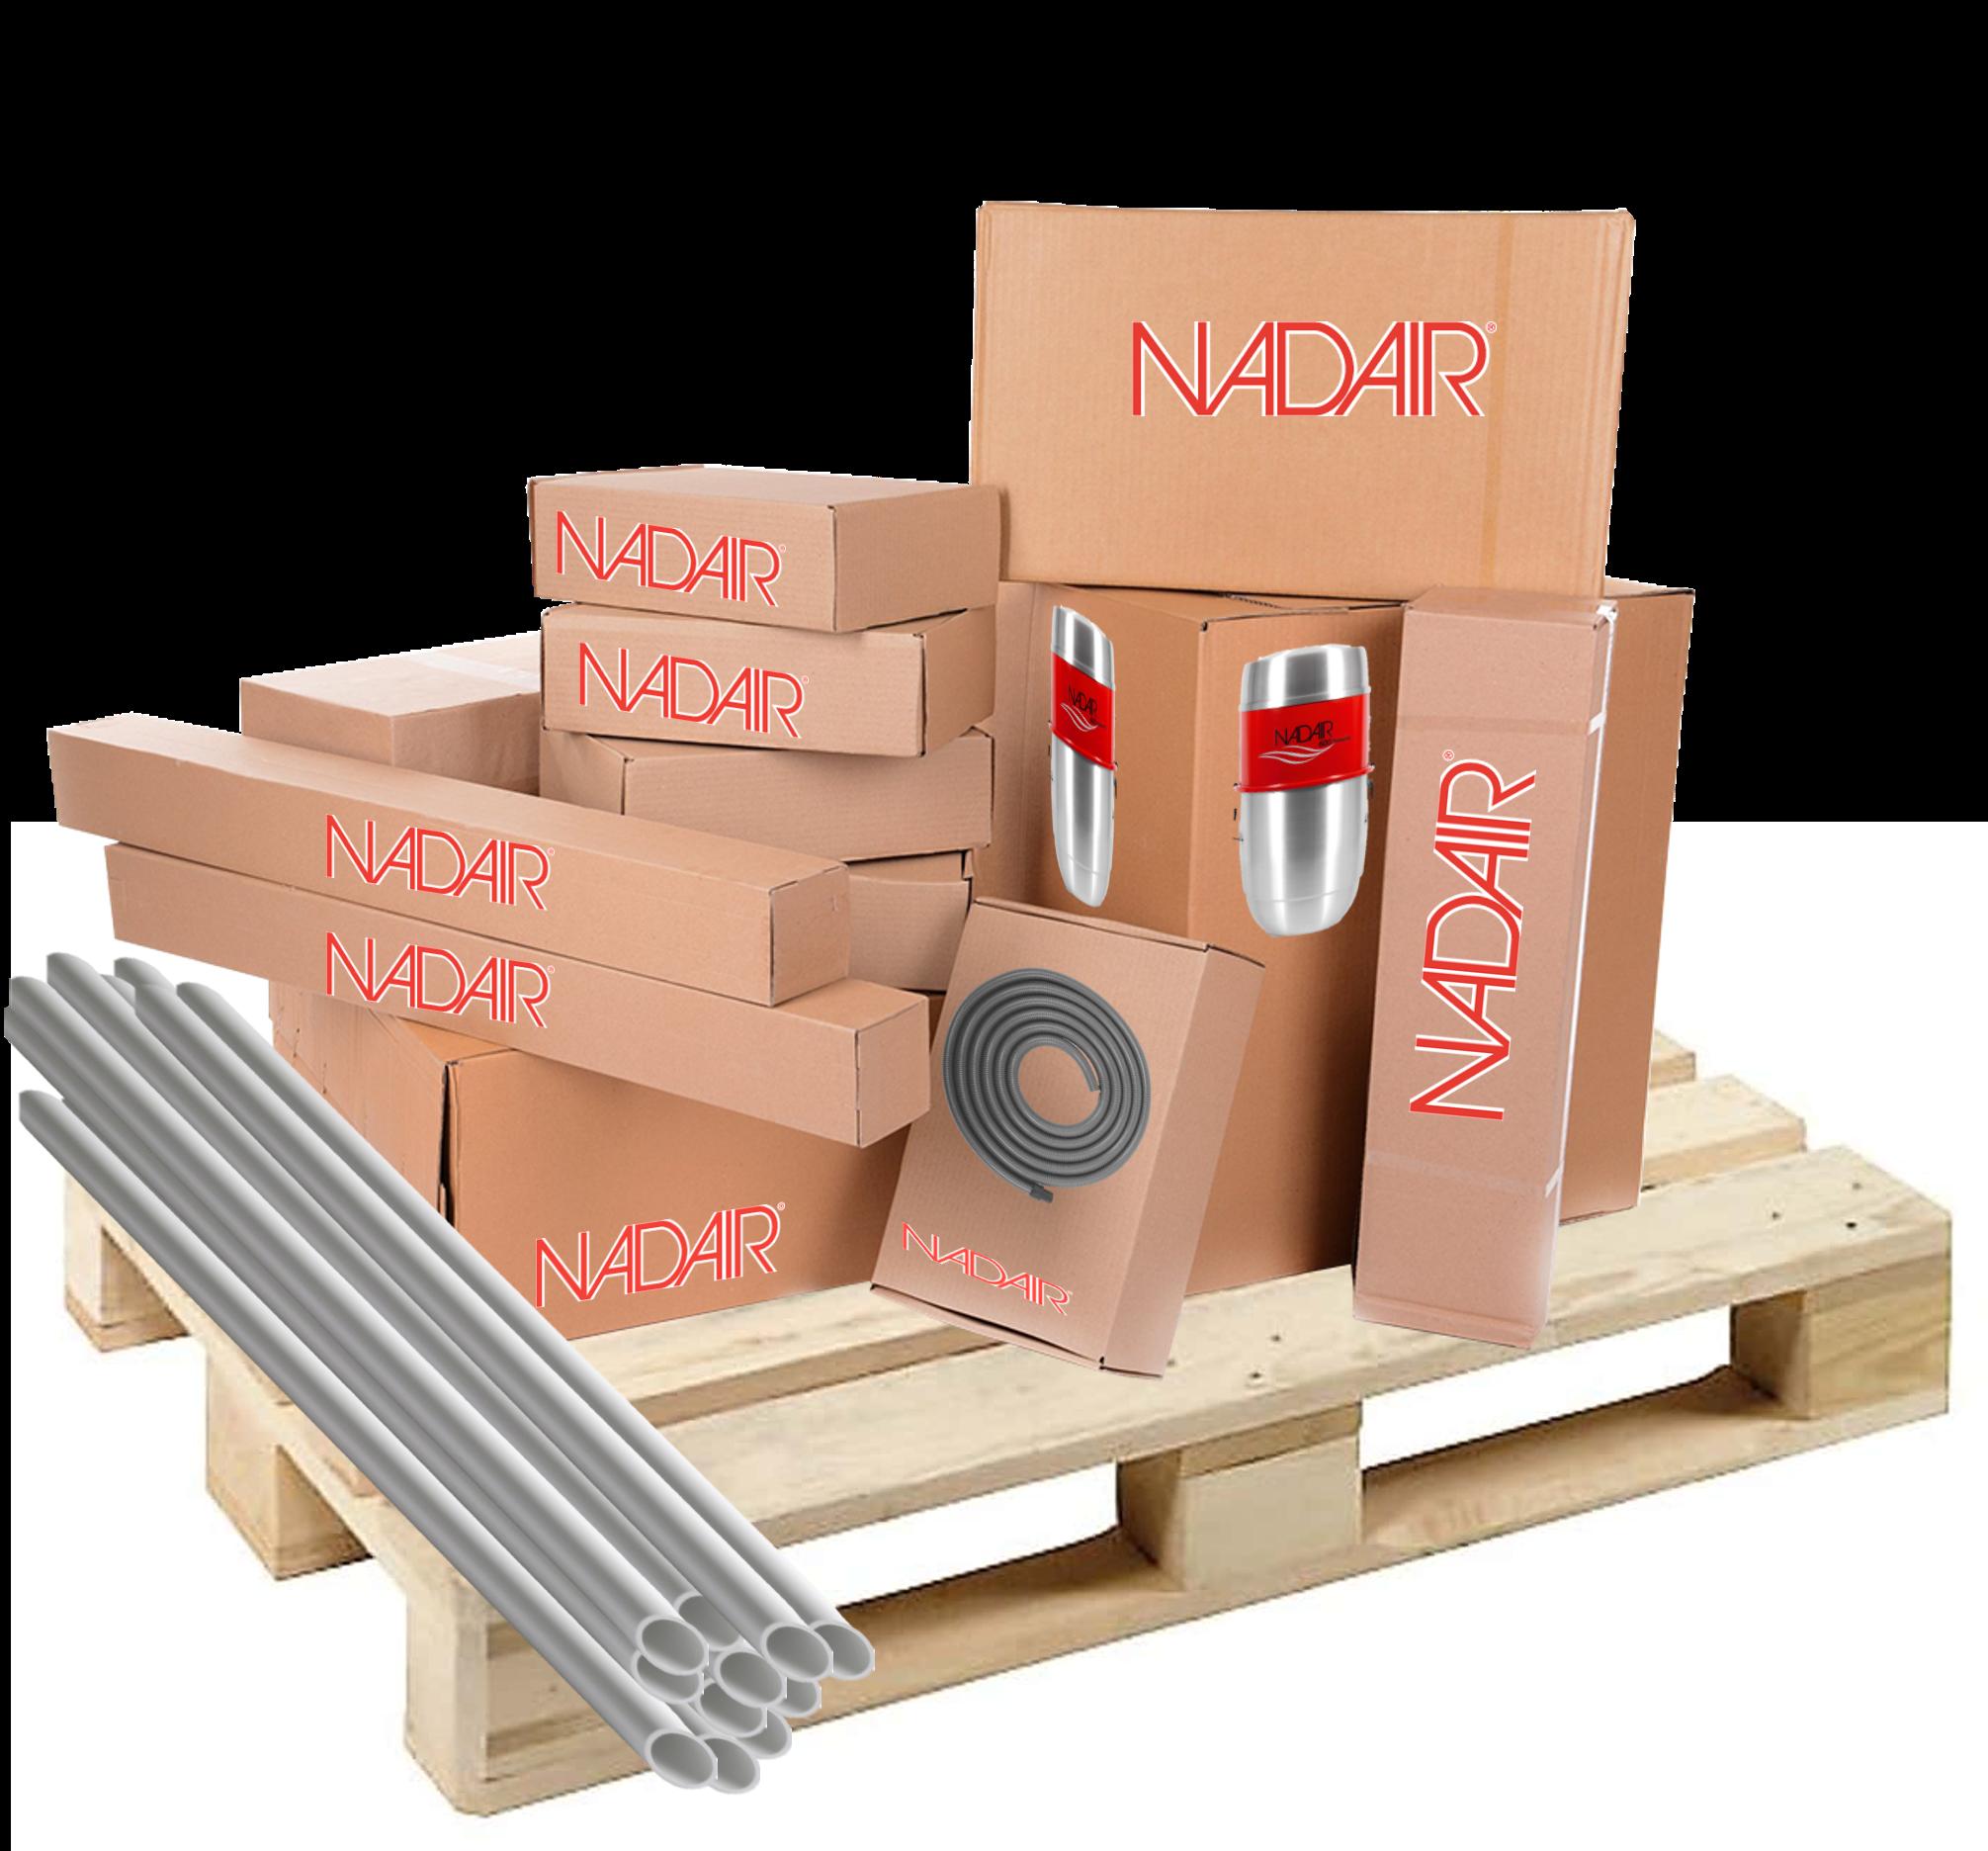 Packs prêt à poser aspiration centralisée Nadair top qualité